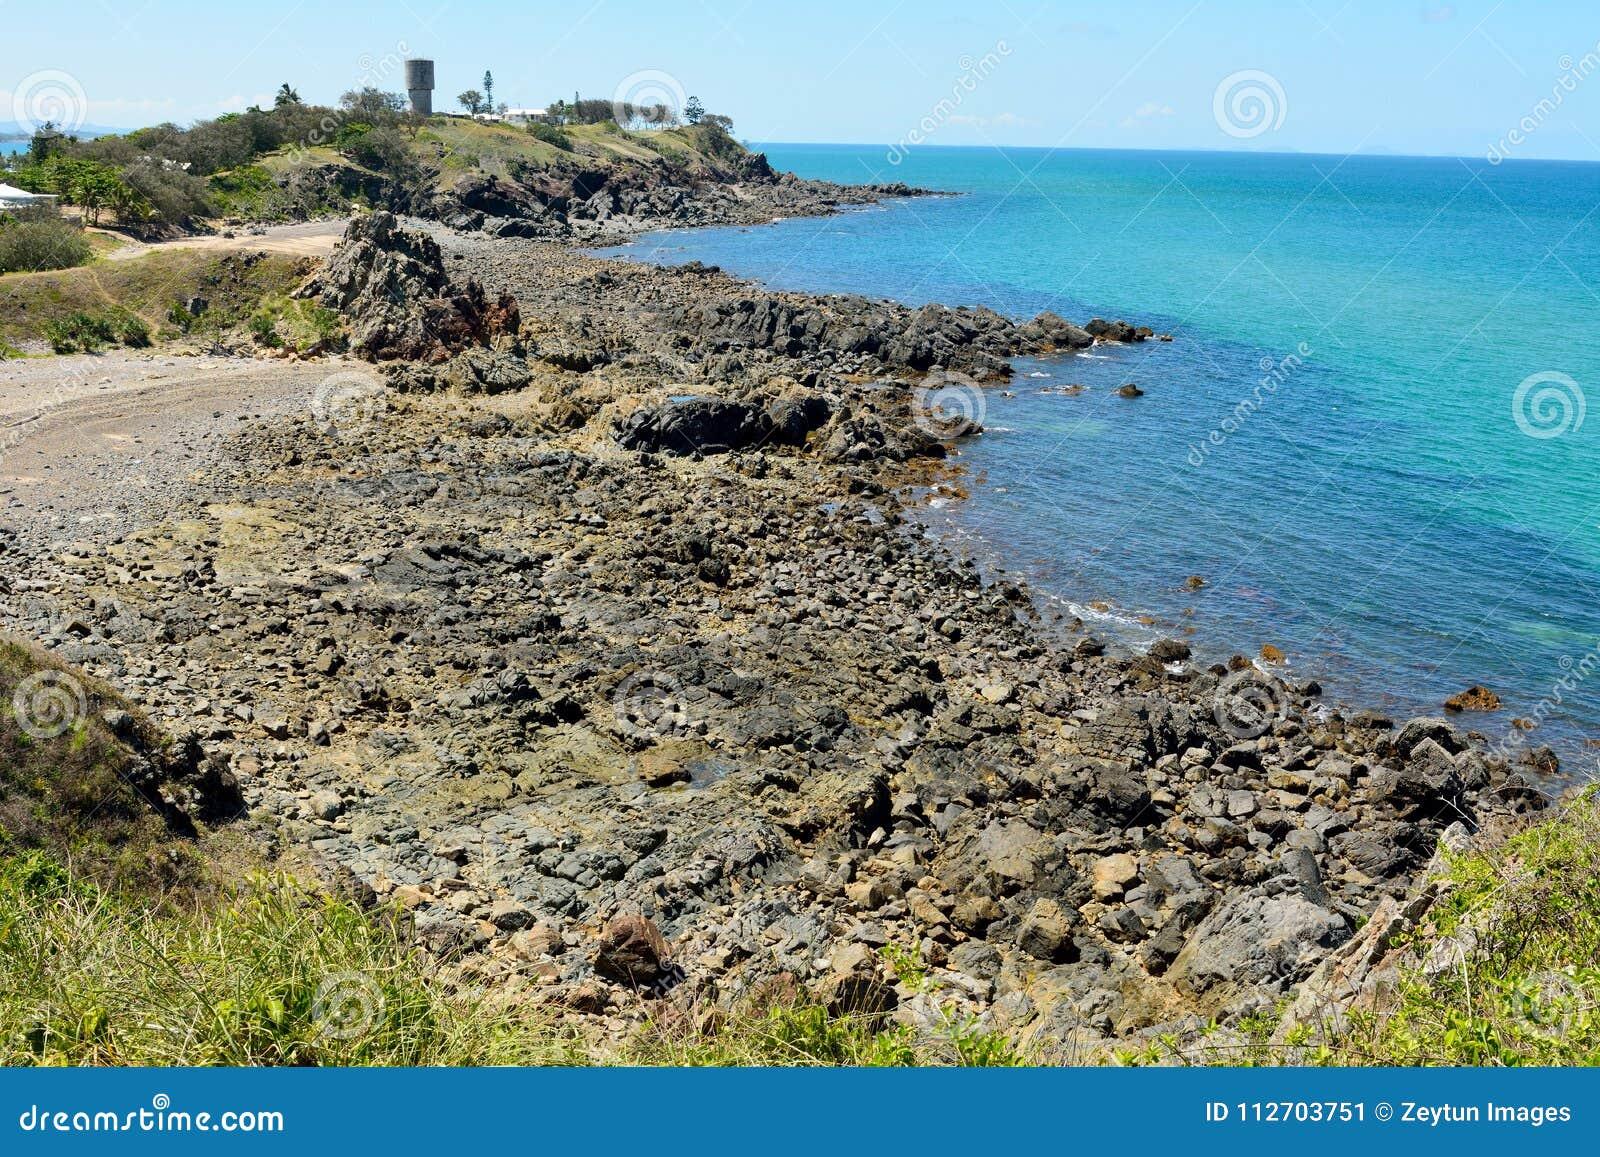 Felsige Küstenlinie nördlich Lamberts-Strandes in Mackay, Australien